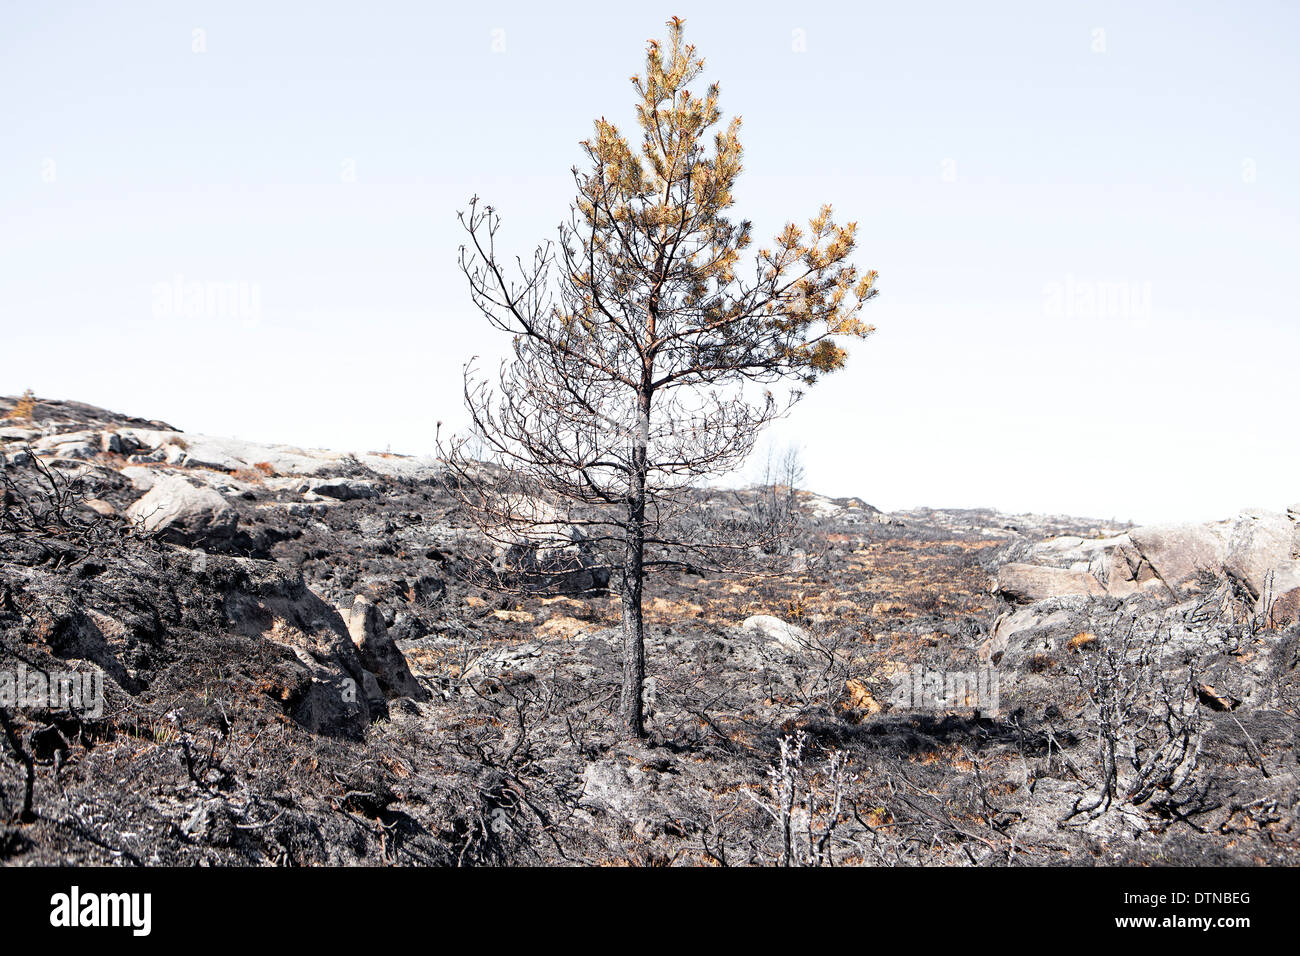 burnt trees in minimalist landscape - Stock Image